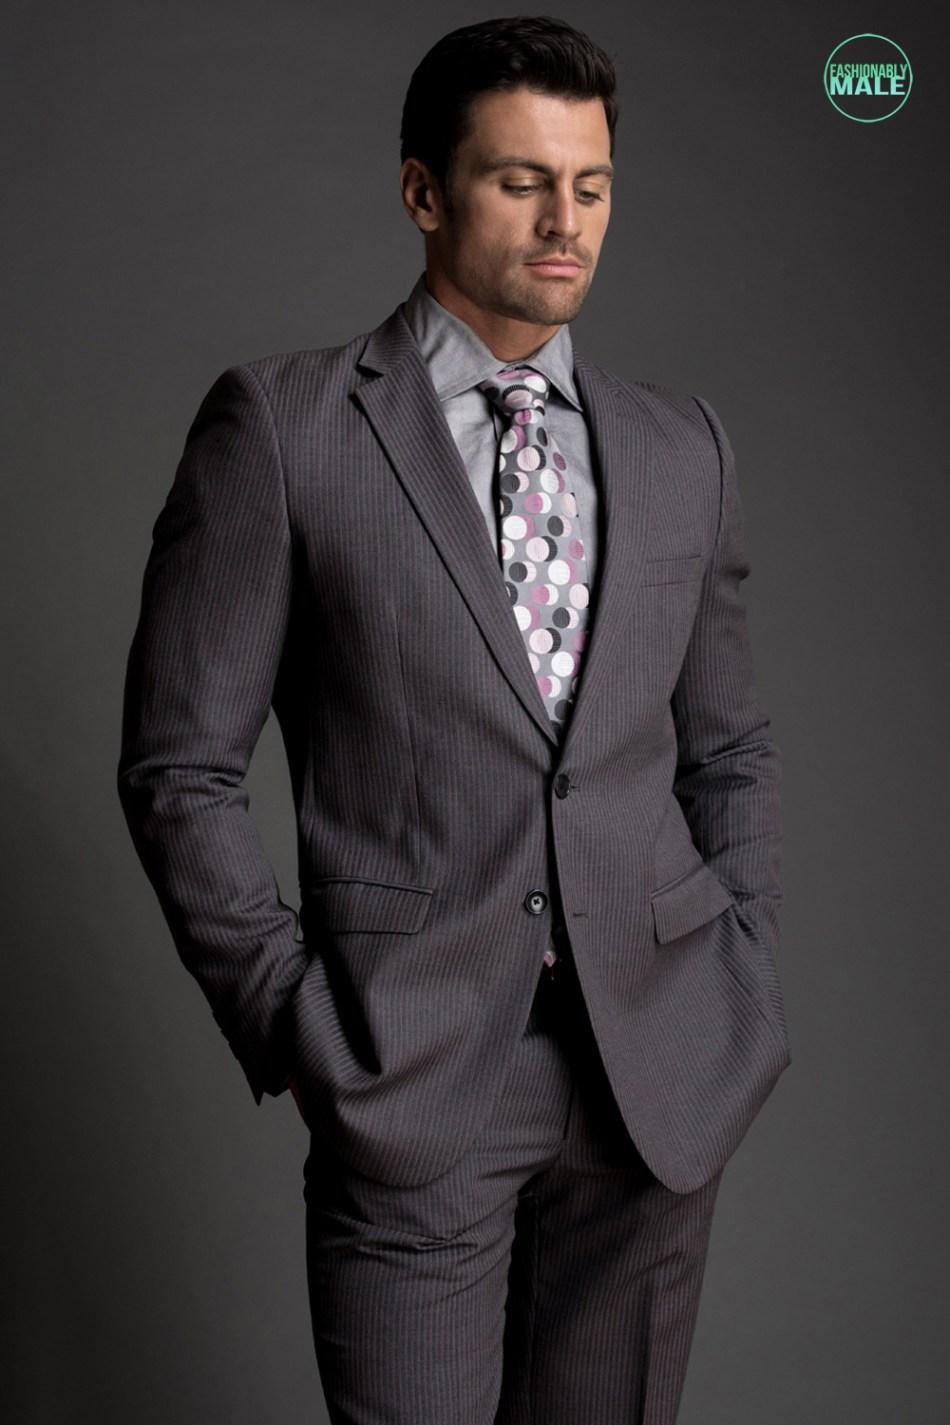 Michael J Scanlon for FashionablyMale (1)